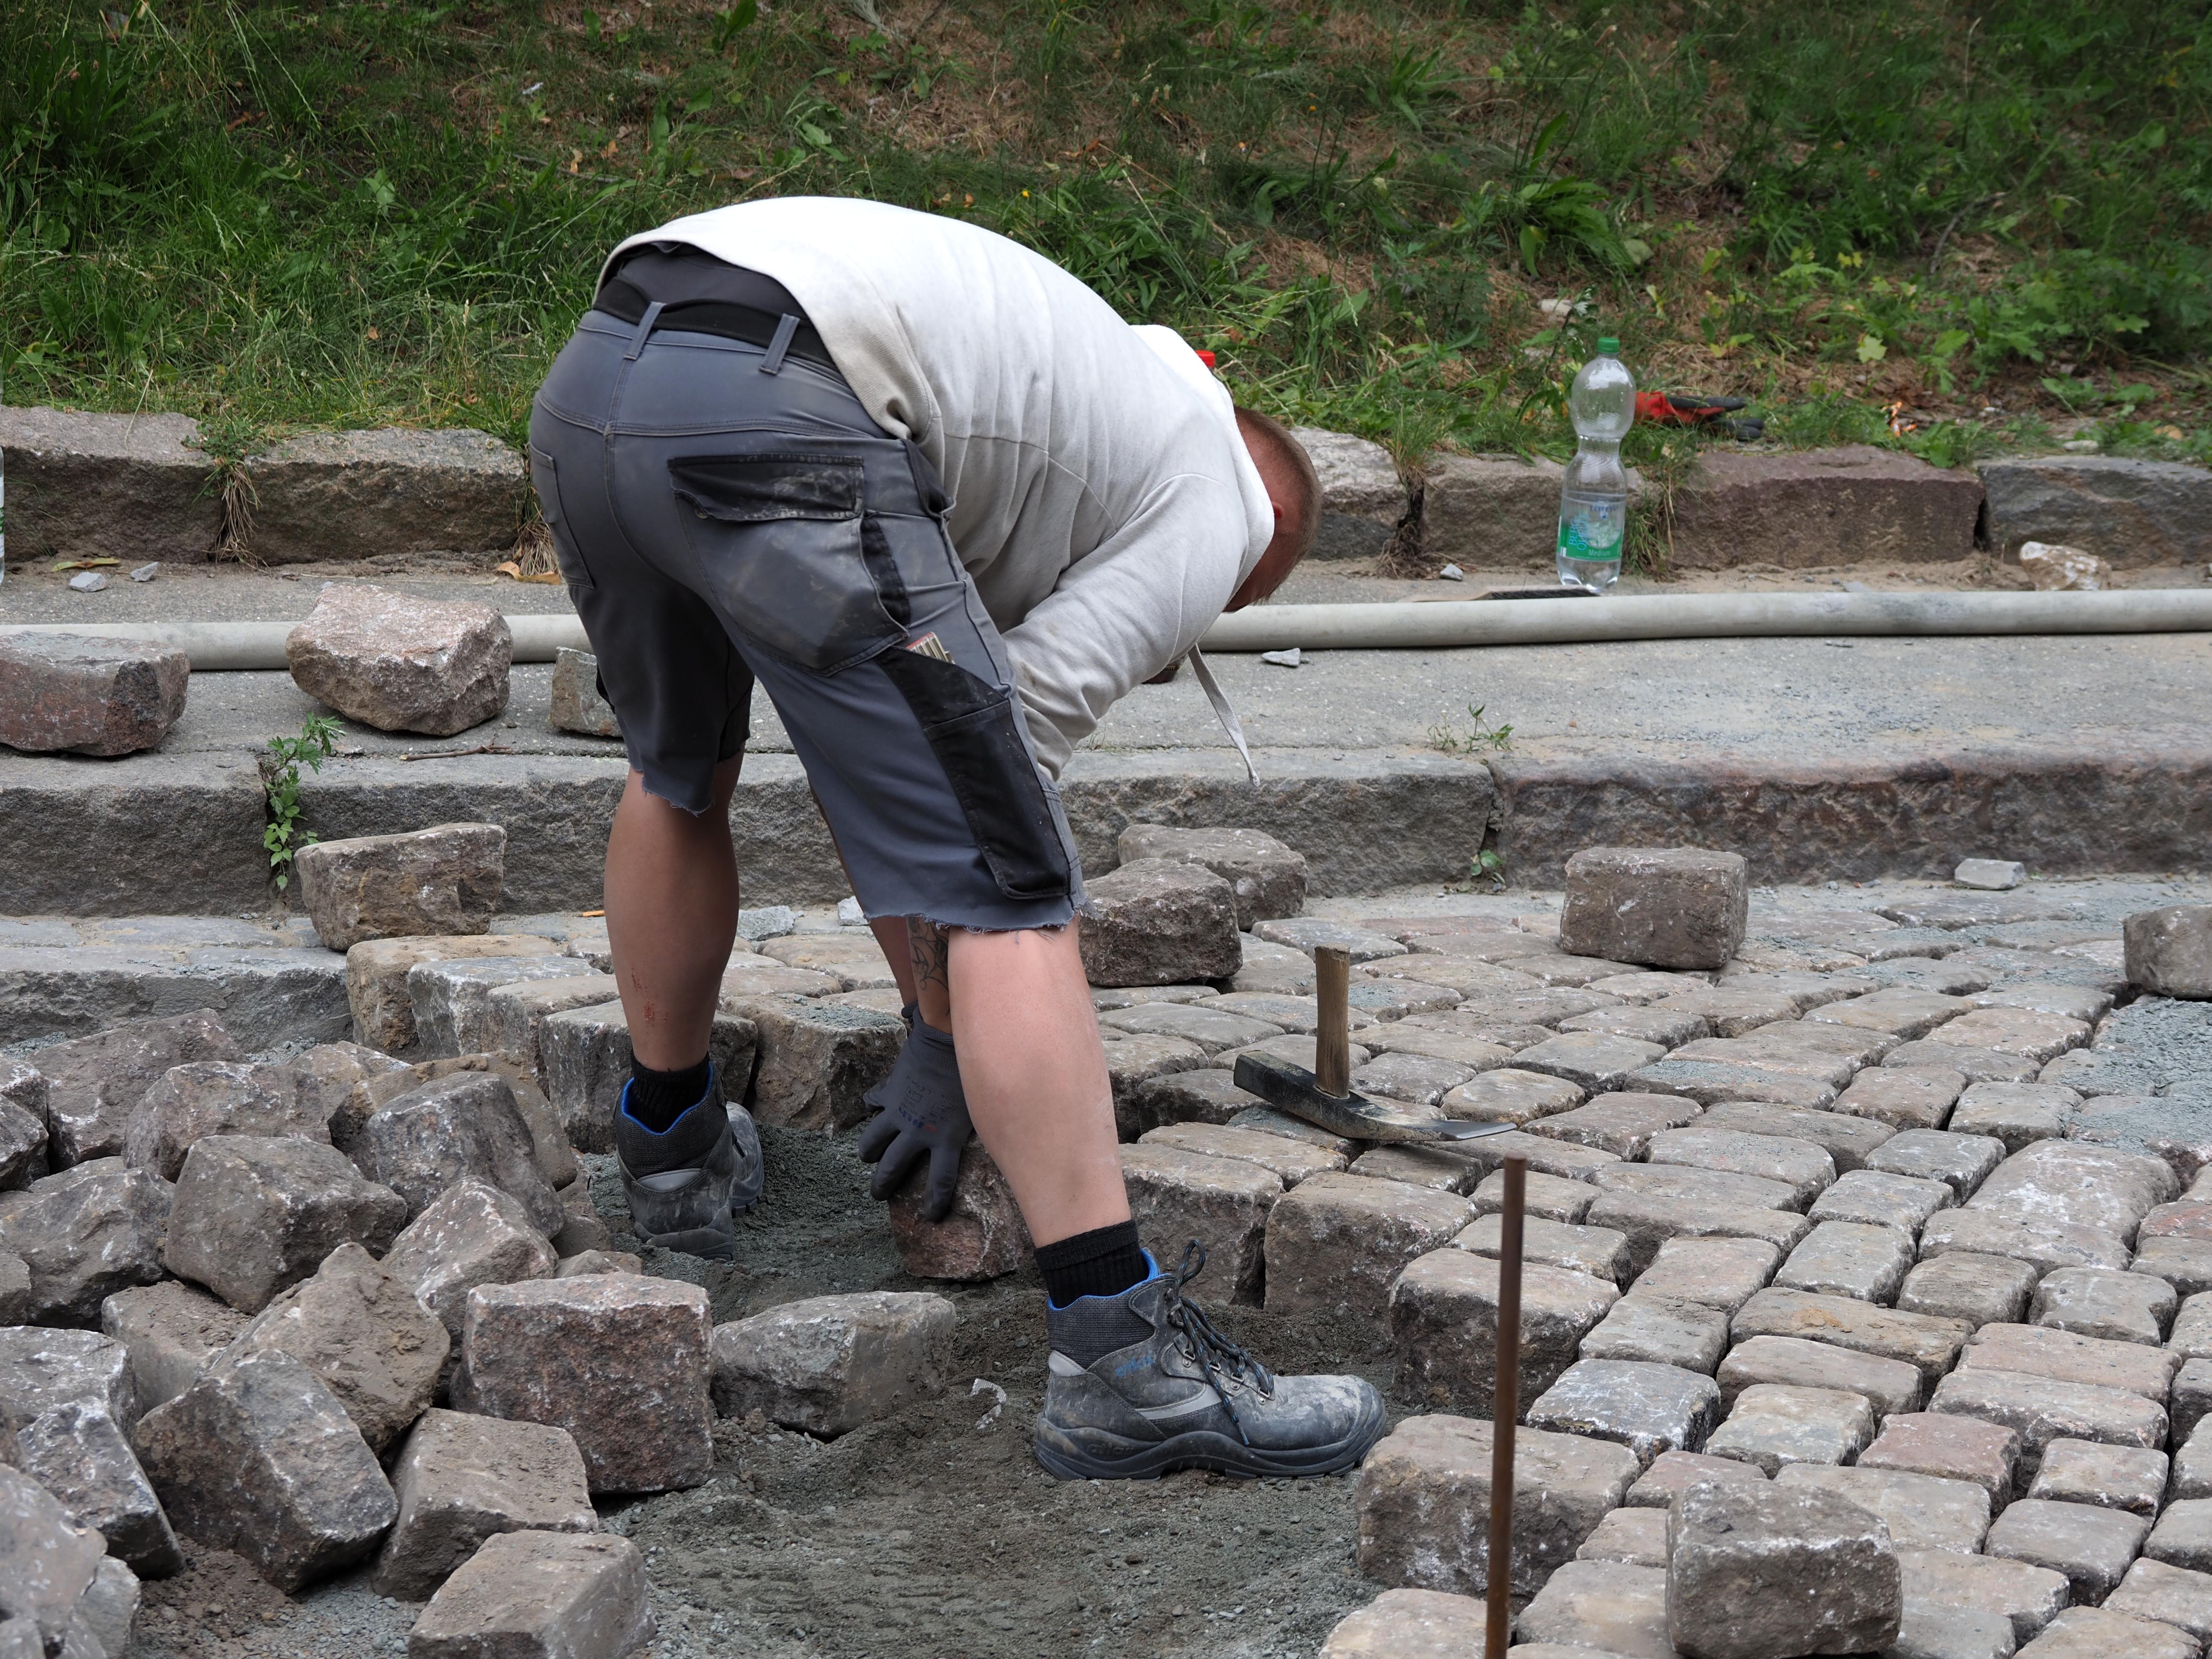 Pflasterarbeiten im Straßenbau